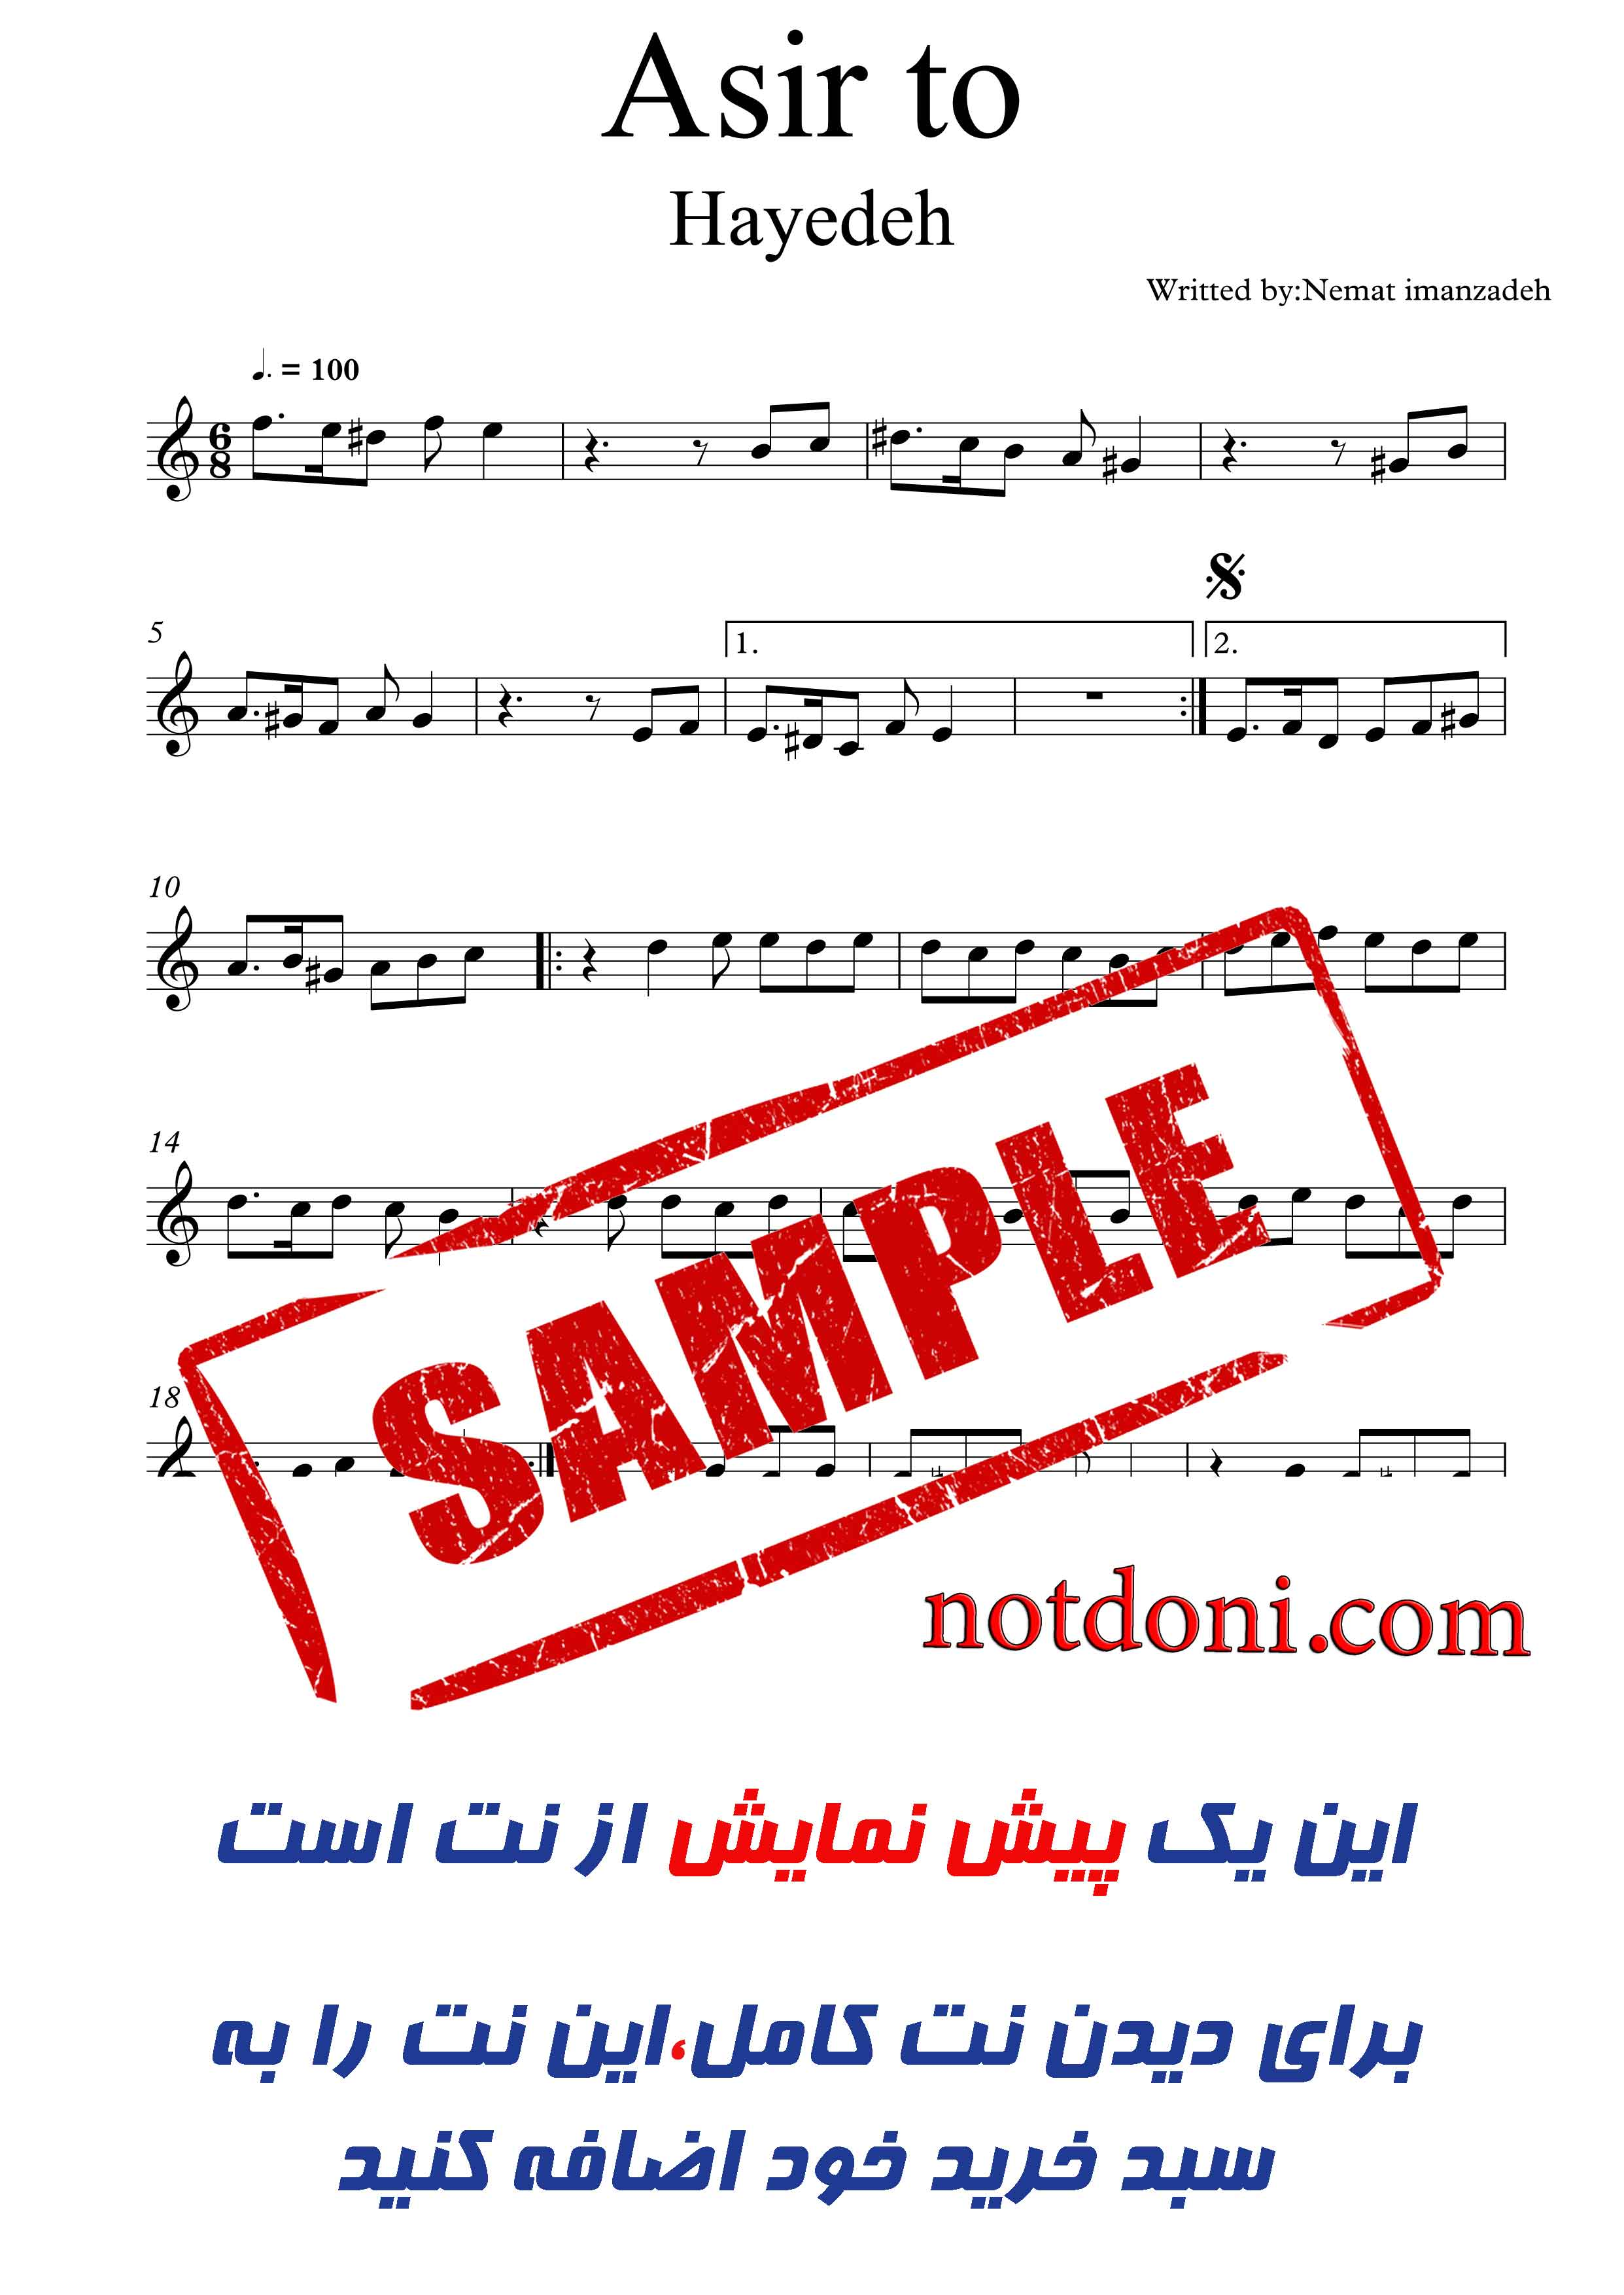 9fb3e40a-0957-4e1a-a683-4ba5fac0712c_نت-آهنگ.jpg